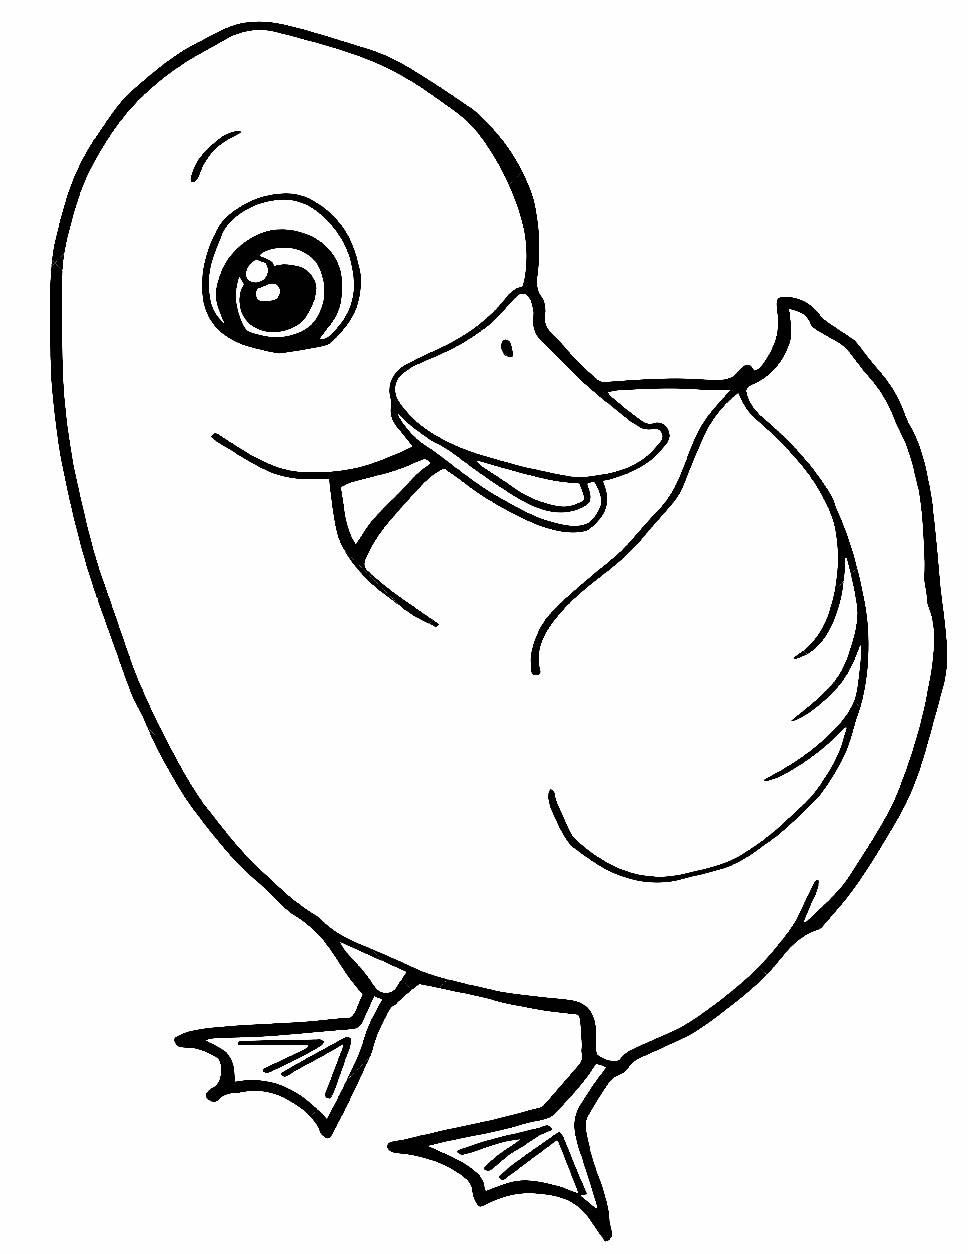 Desenho de pato para colorir